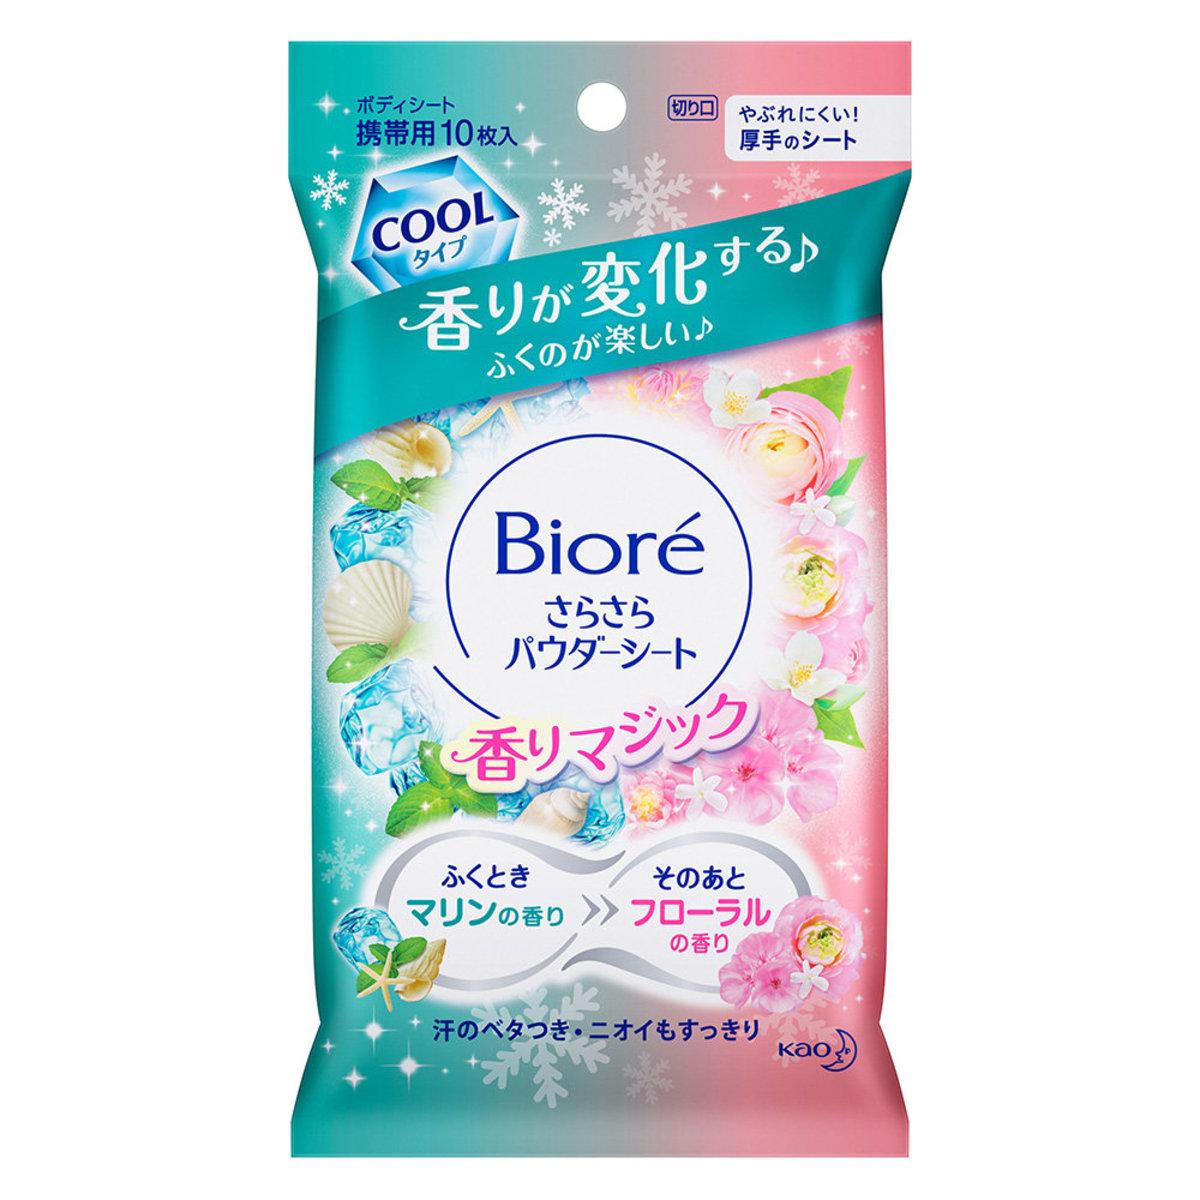 KAO Biore Moist Tissue (Magic Scent) 花王 碧柔  爽身粉濕紙巾 10枚  海洋花香味(4901301332622)